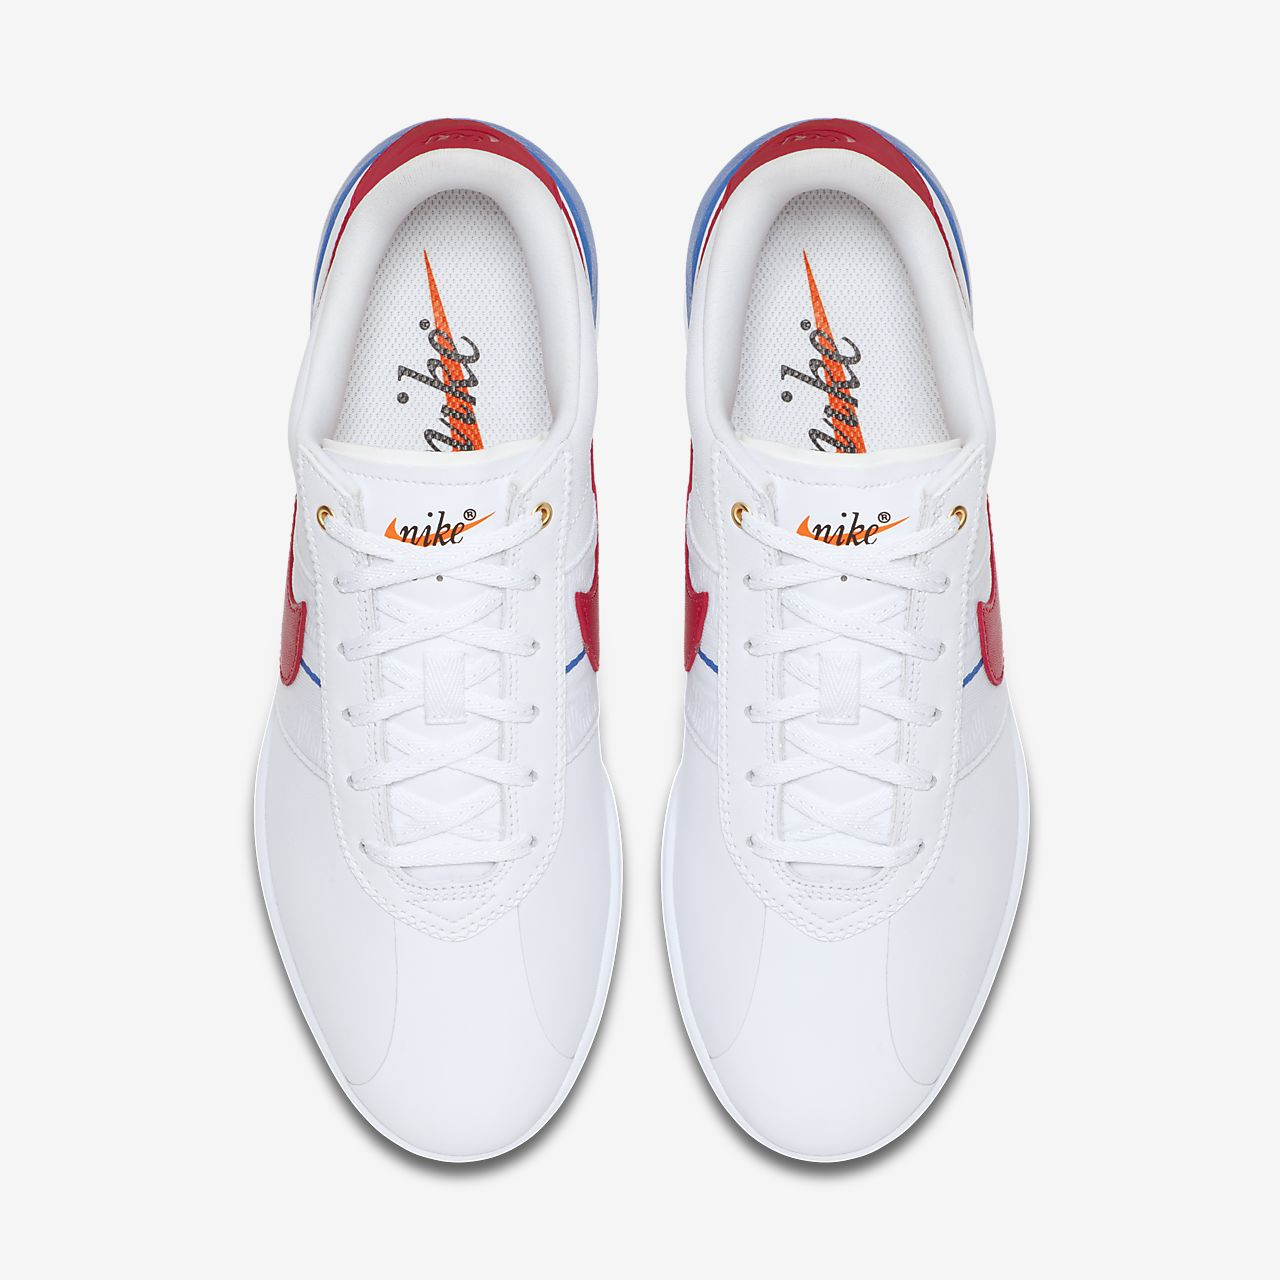 b8142f6602b Женские кроссовки для гольфа Nike Cortez G. Nike.com RU